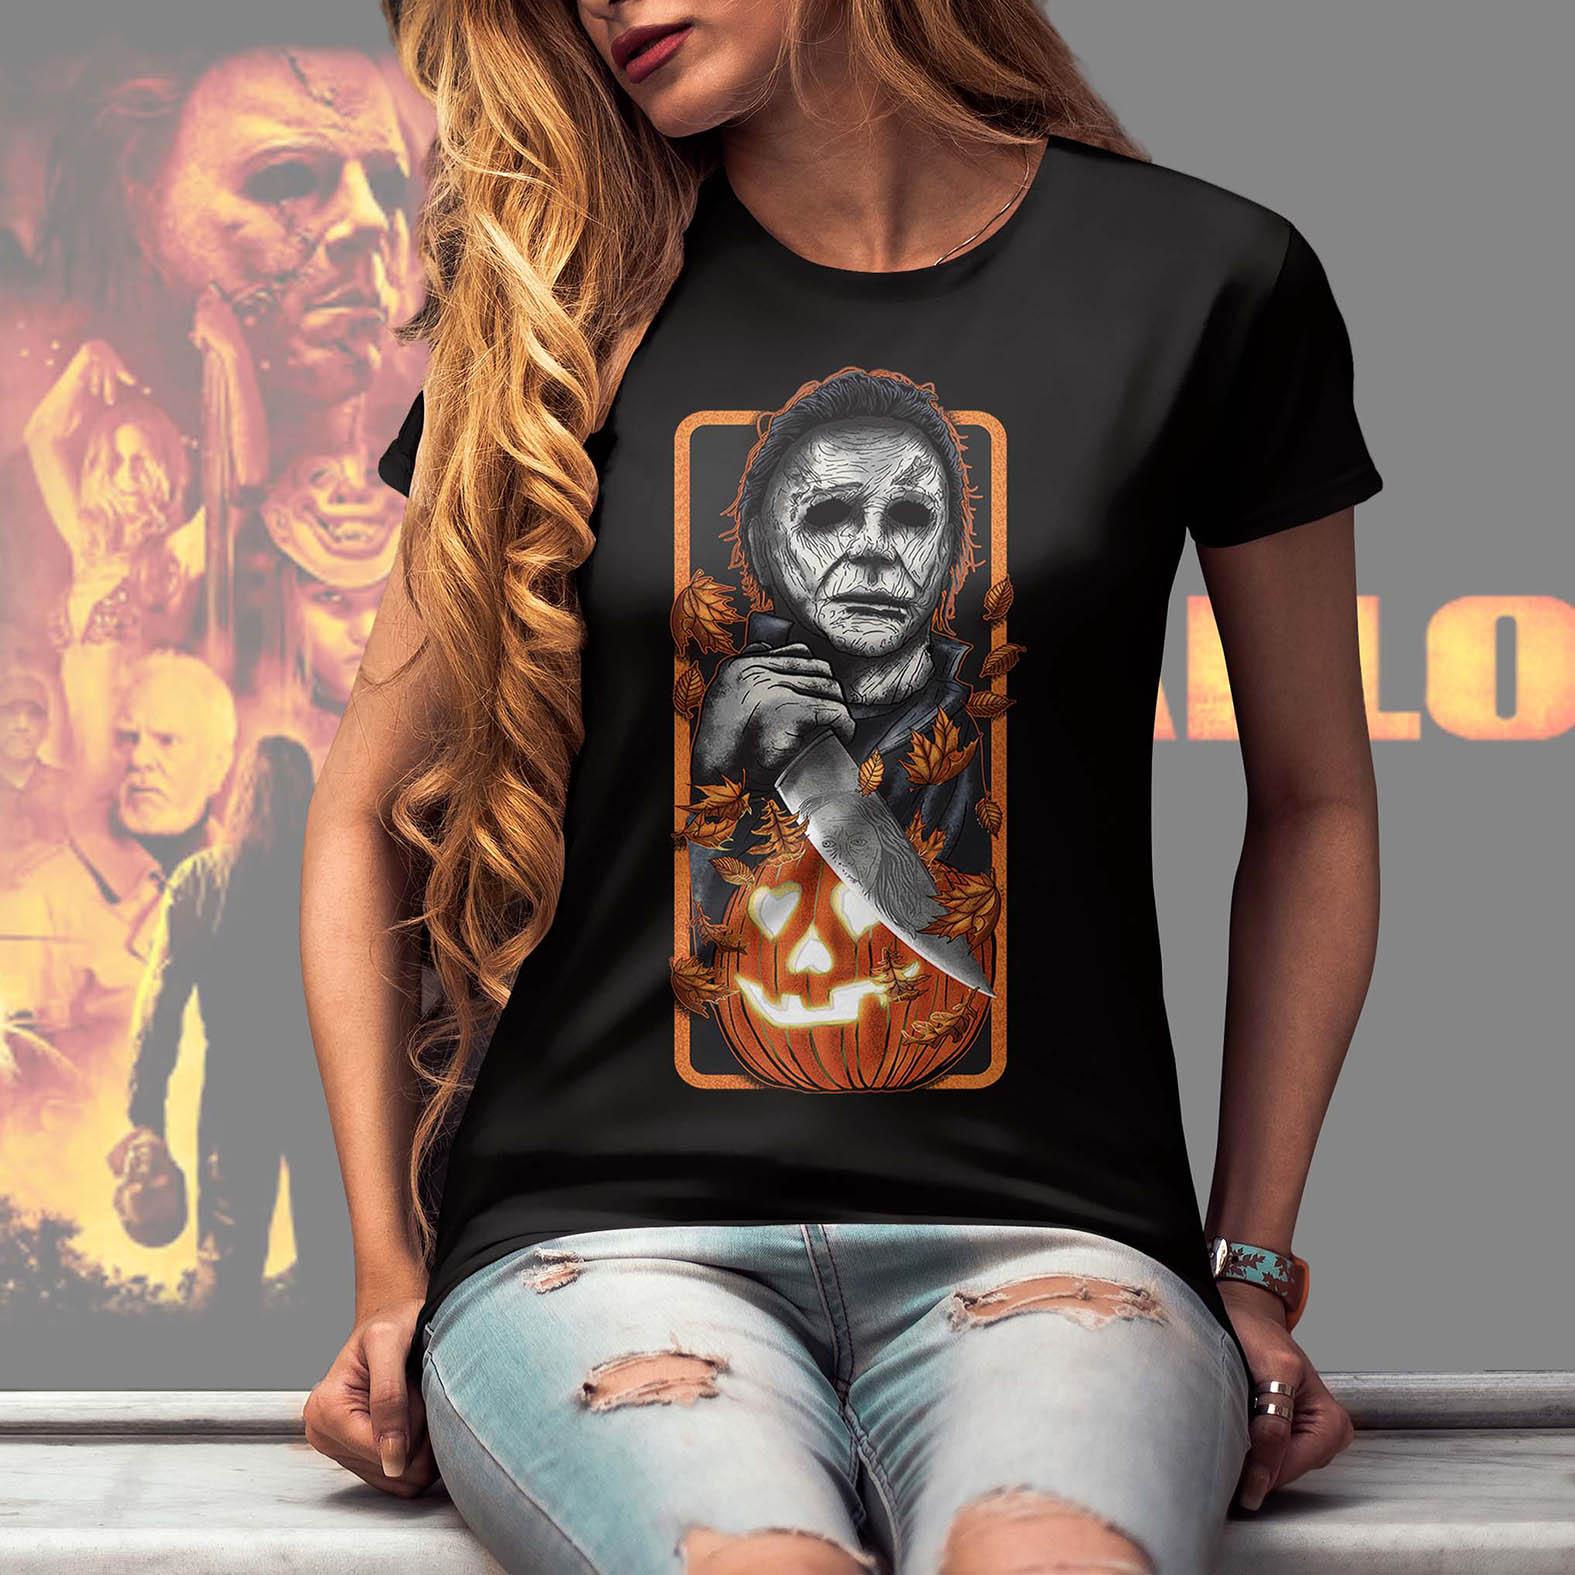 Camiseta Feminina Unissex Michael Myers Halloween Abóbora Terror Horror Serial Killer (Preta) - EV